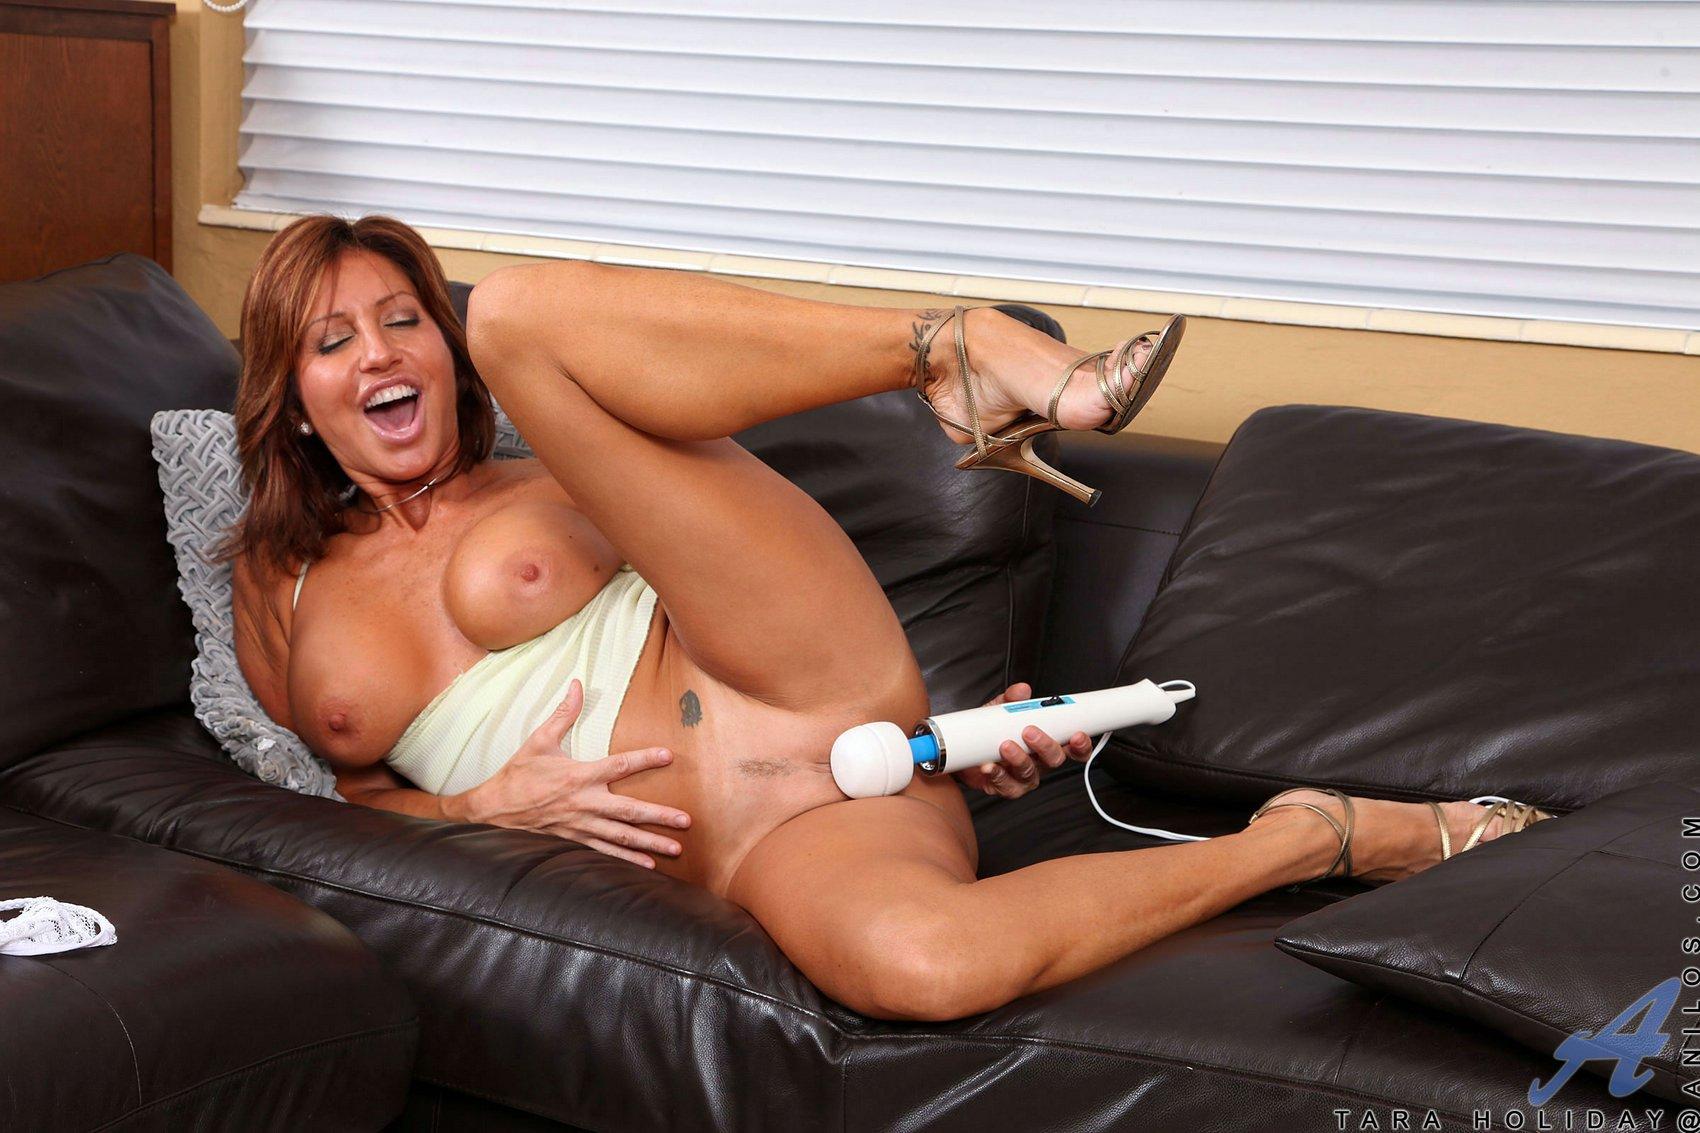 image Sexy milf tara holiday riding cock